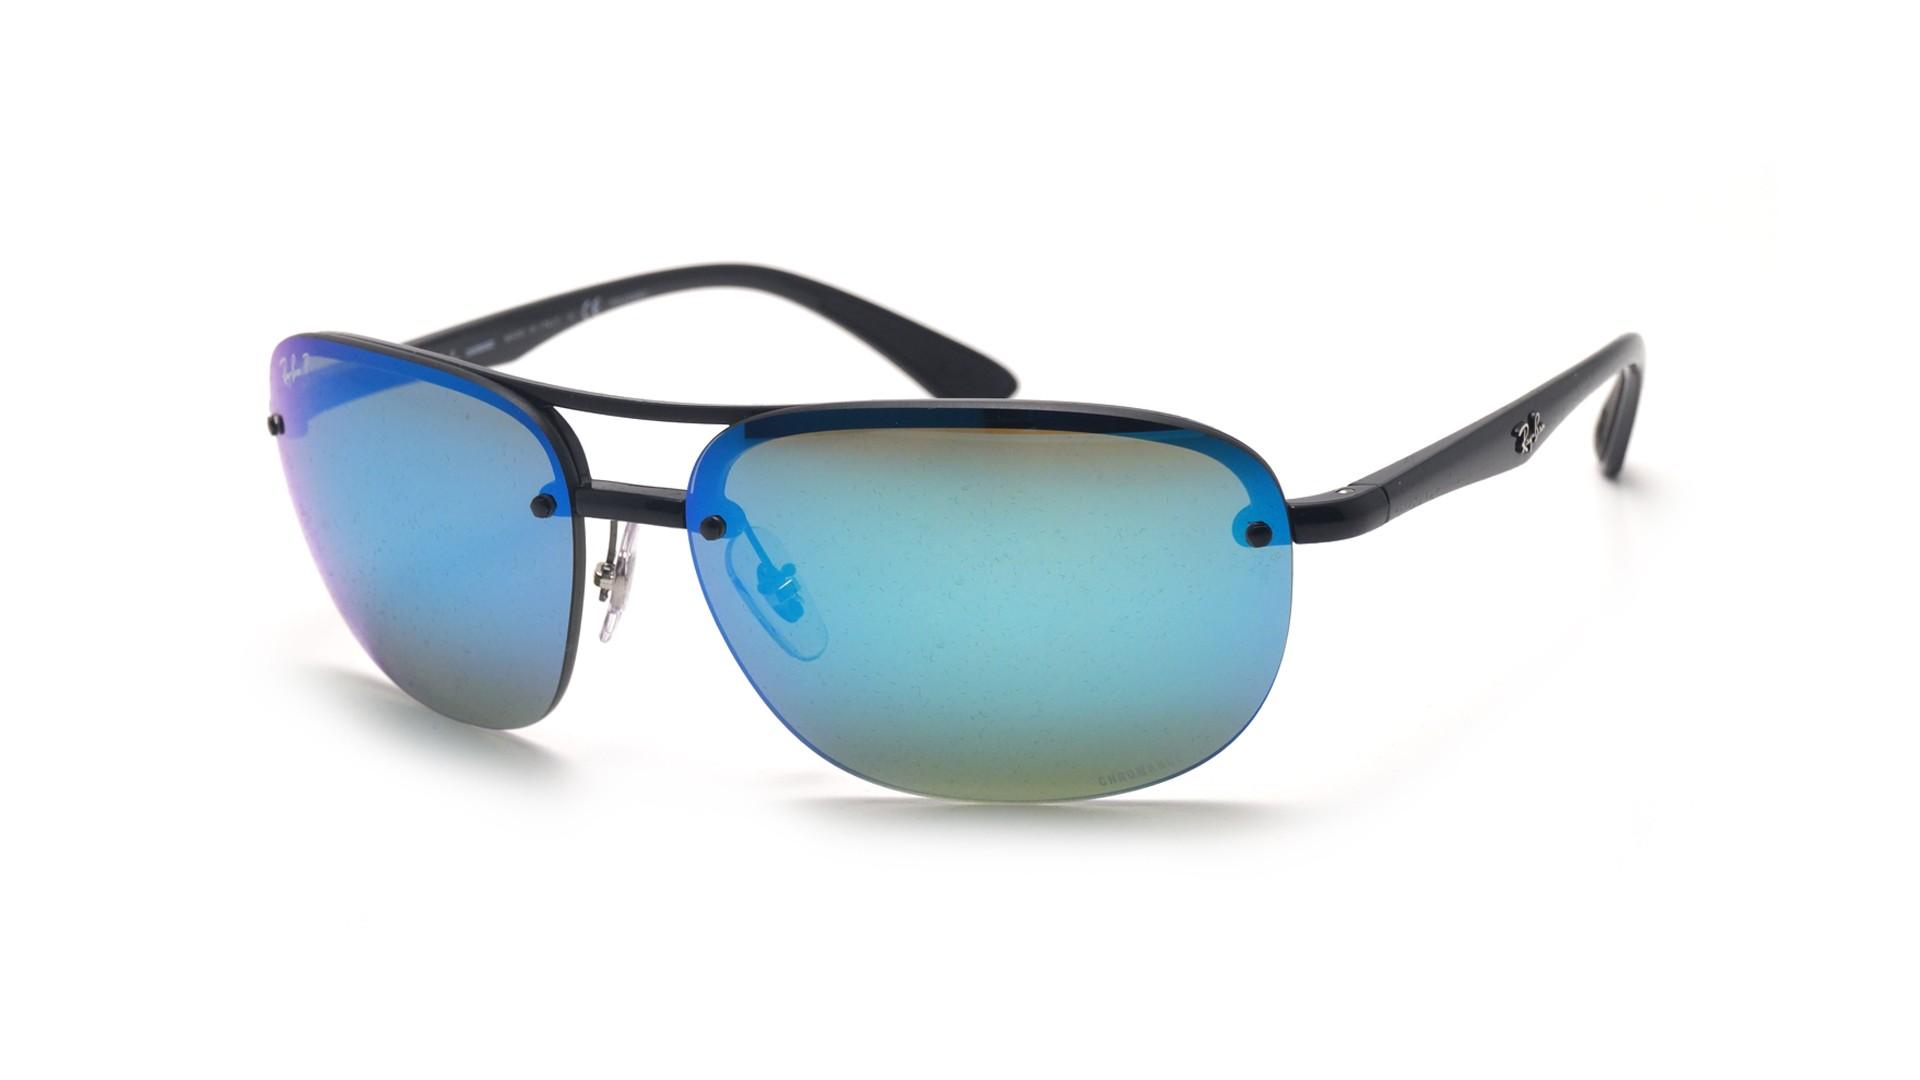 4615b32848 ... authentic sunglasses ray ban rb4275ch 601 a1 63 15 black chromance  large polarized mirror de03b 70d7a